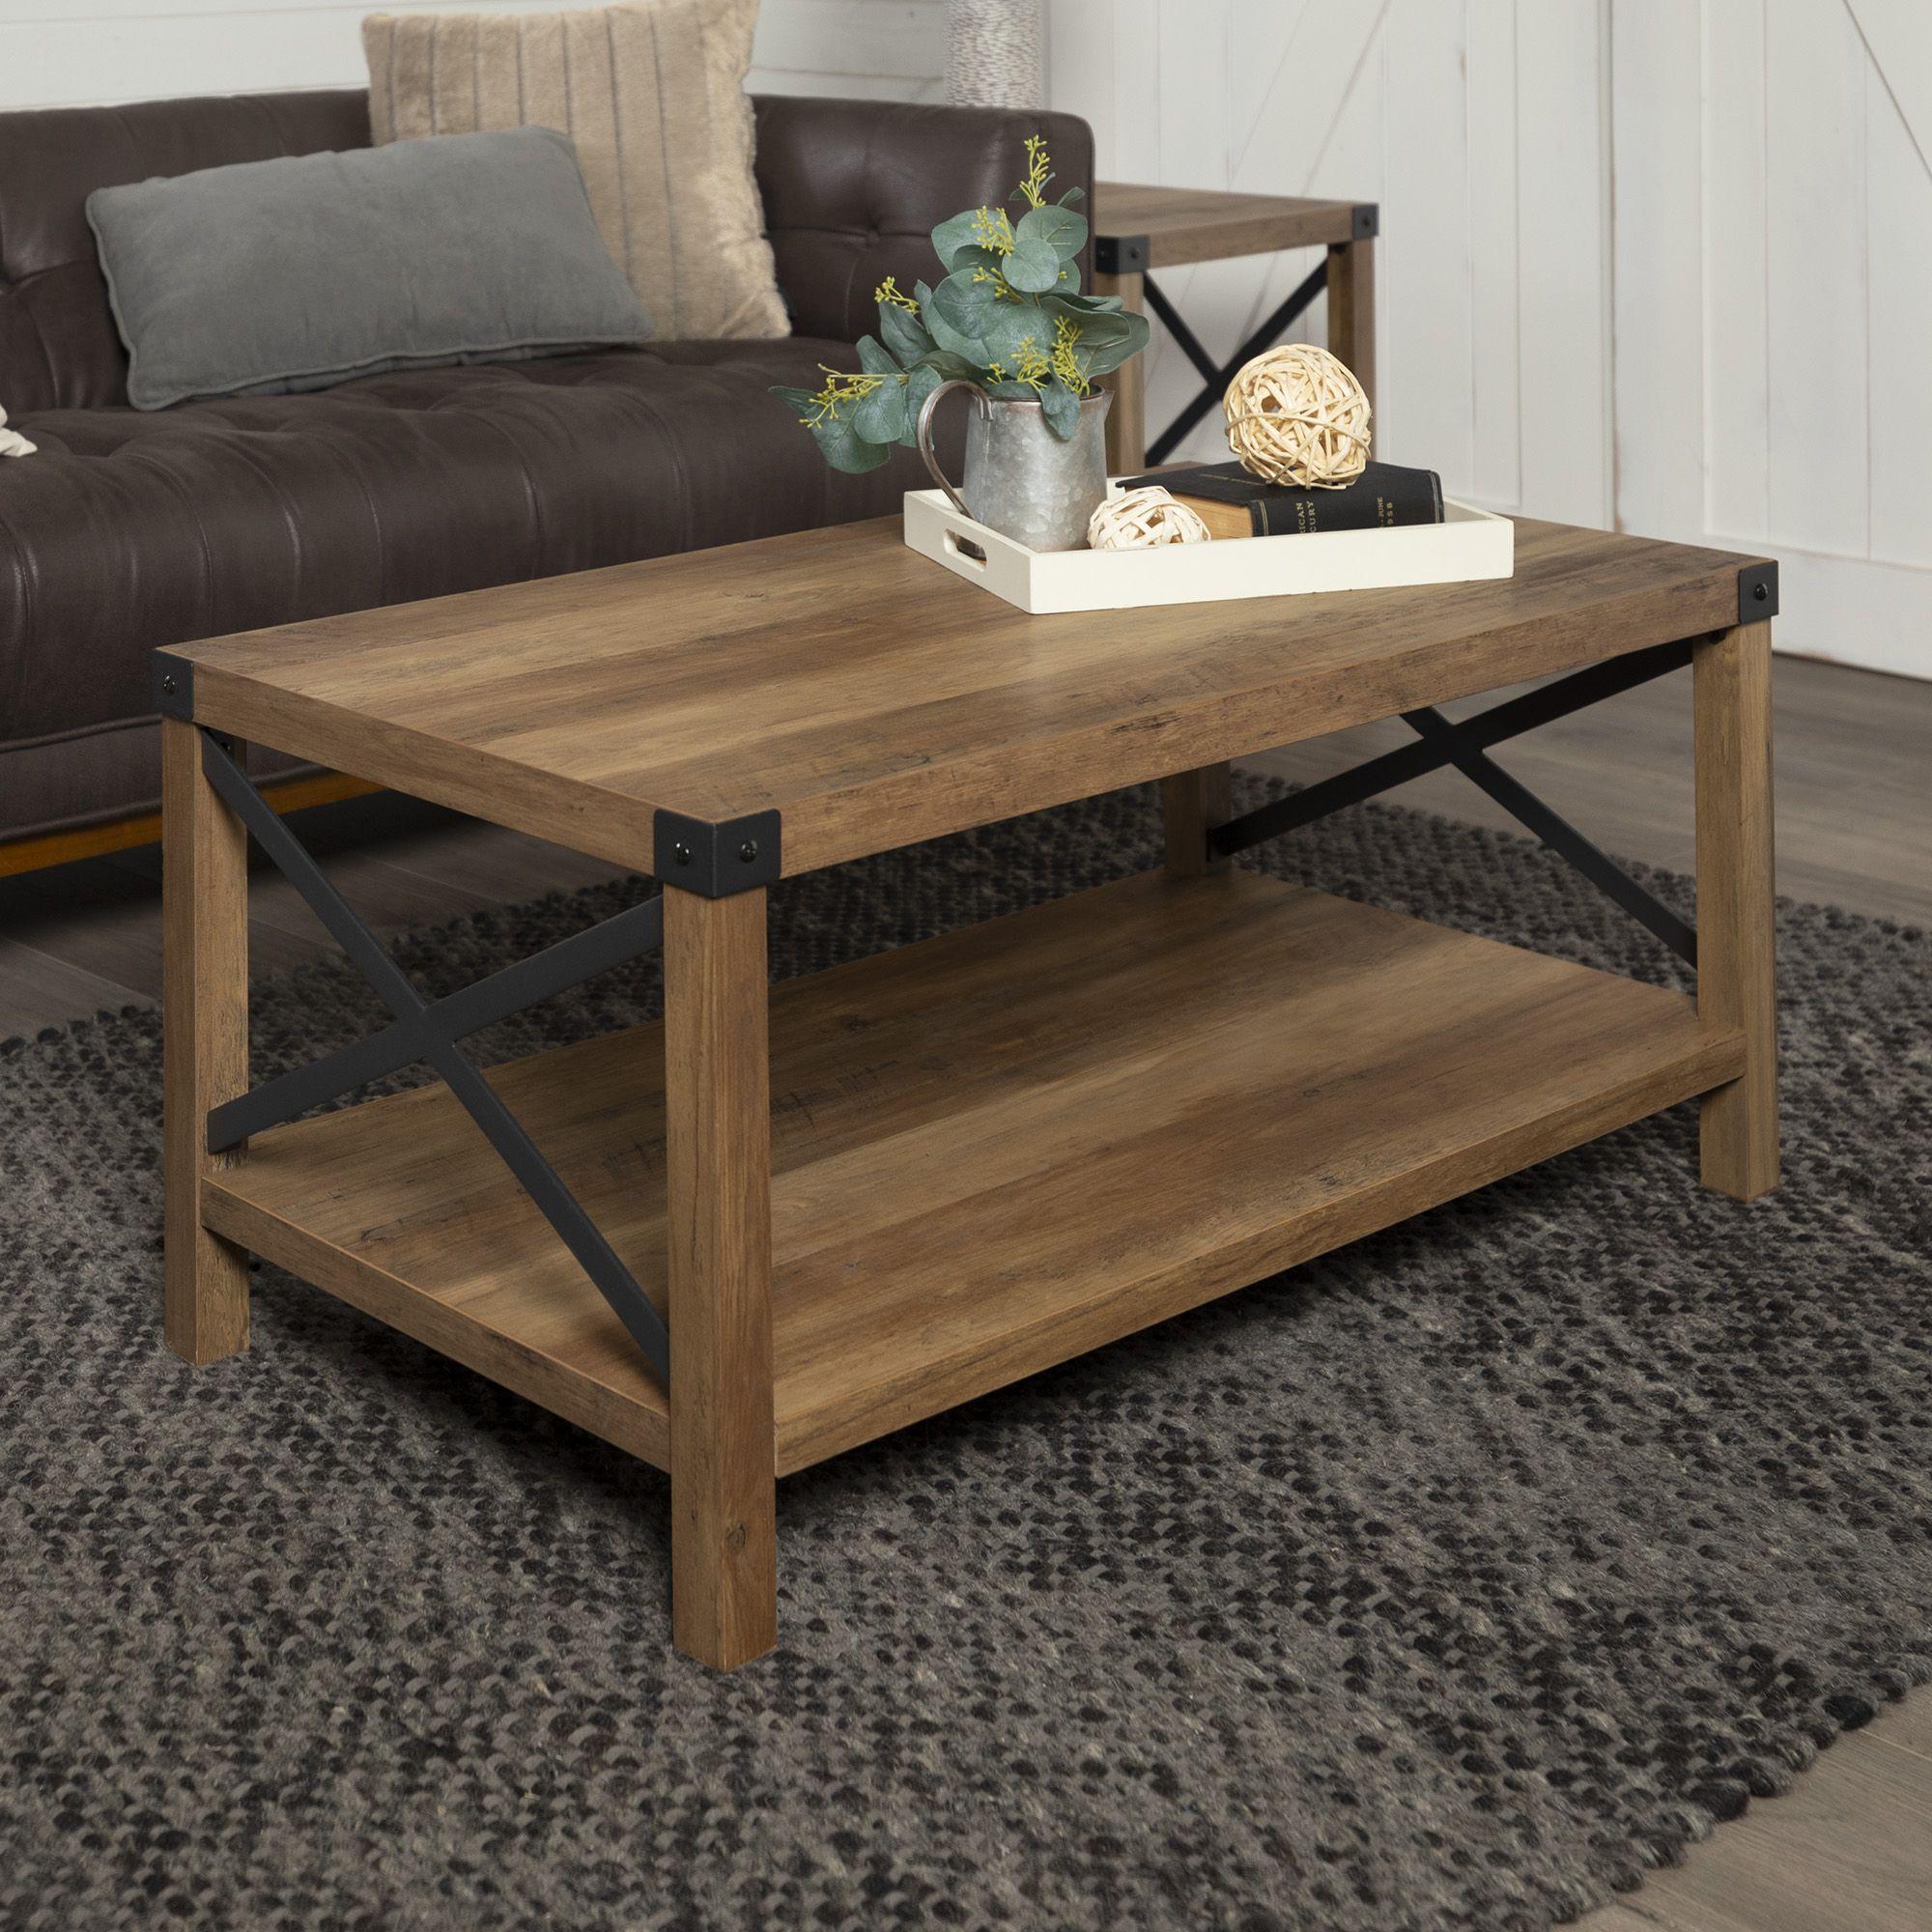 Magnolia Metal X Frame Reclaimed Barnwood Coffee Table By Desert Fields Walmart Com Wood Coffee Table Rustic Barnwood Coffee Table Coffee Table [ 2000 x 2000 Pixel ]